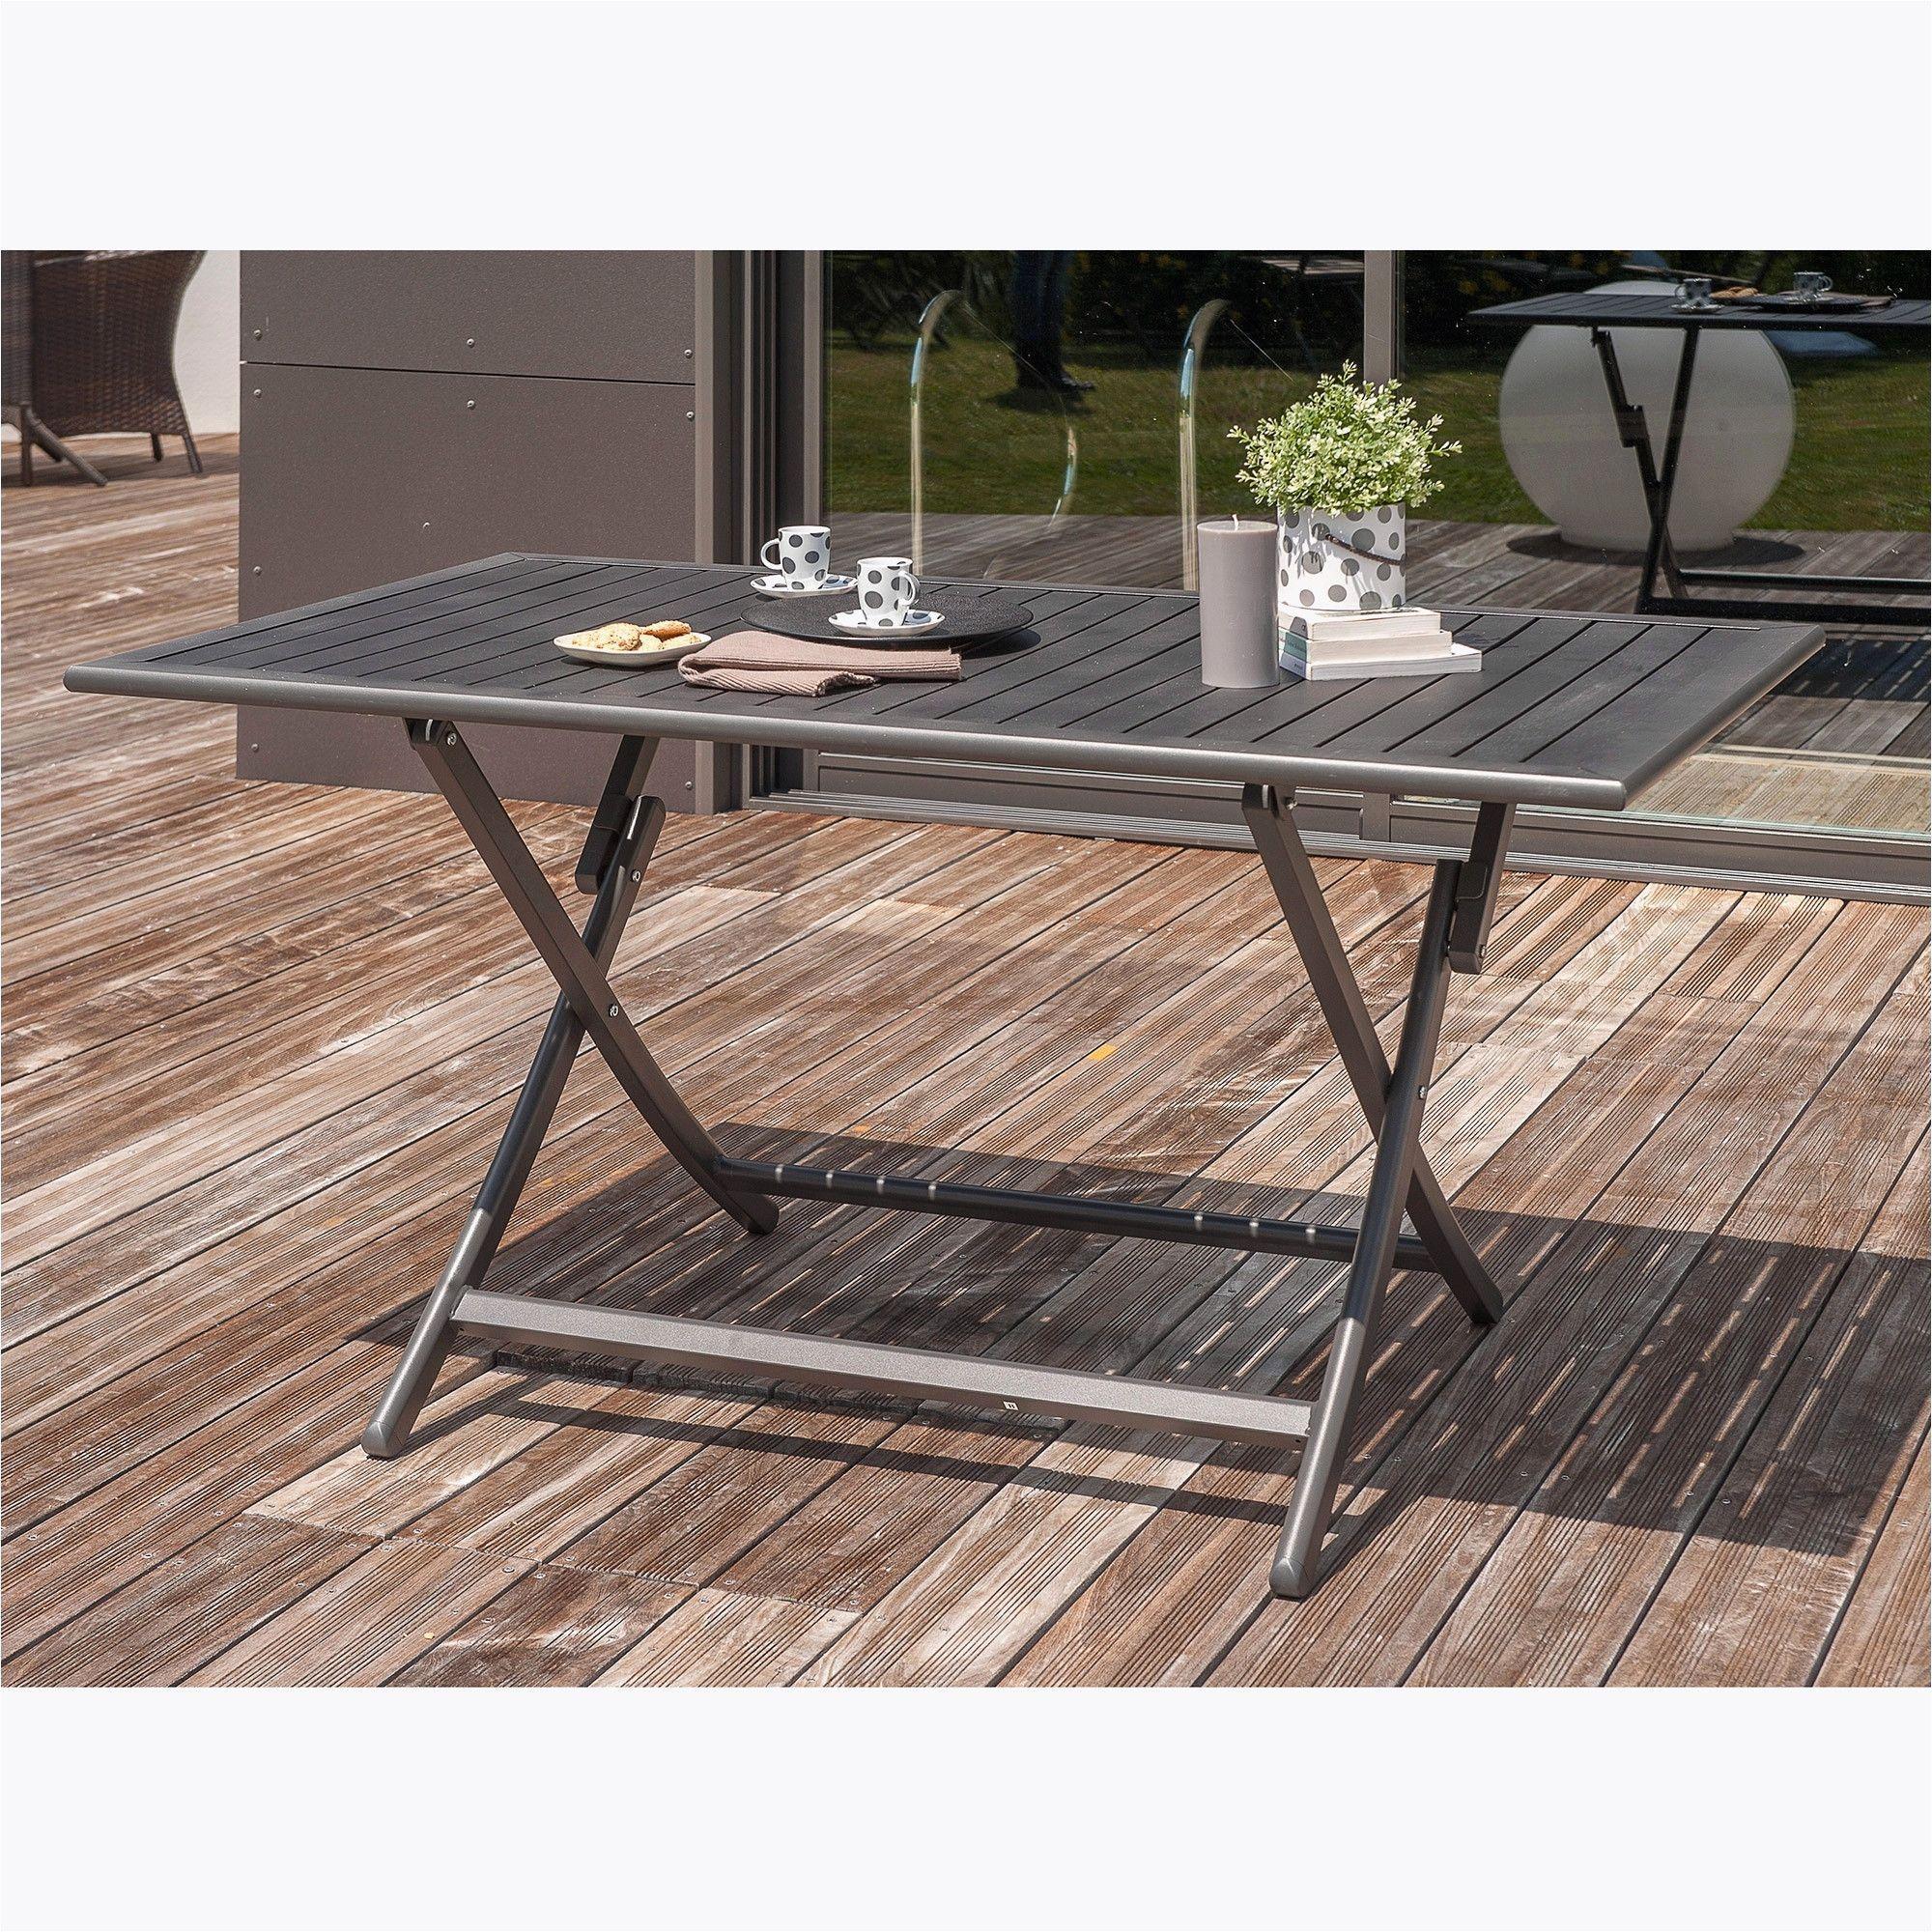 Table Jardin Resine Inspirant Table Pliante Leclerc Beau S Leclerc Table De Jardin Of 24 Charmant Table Jardin Resine